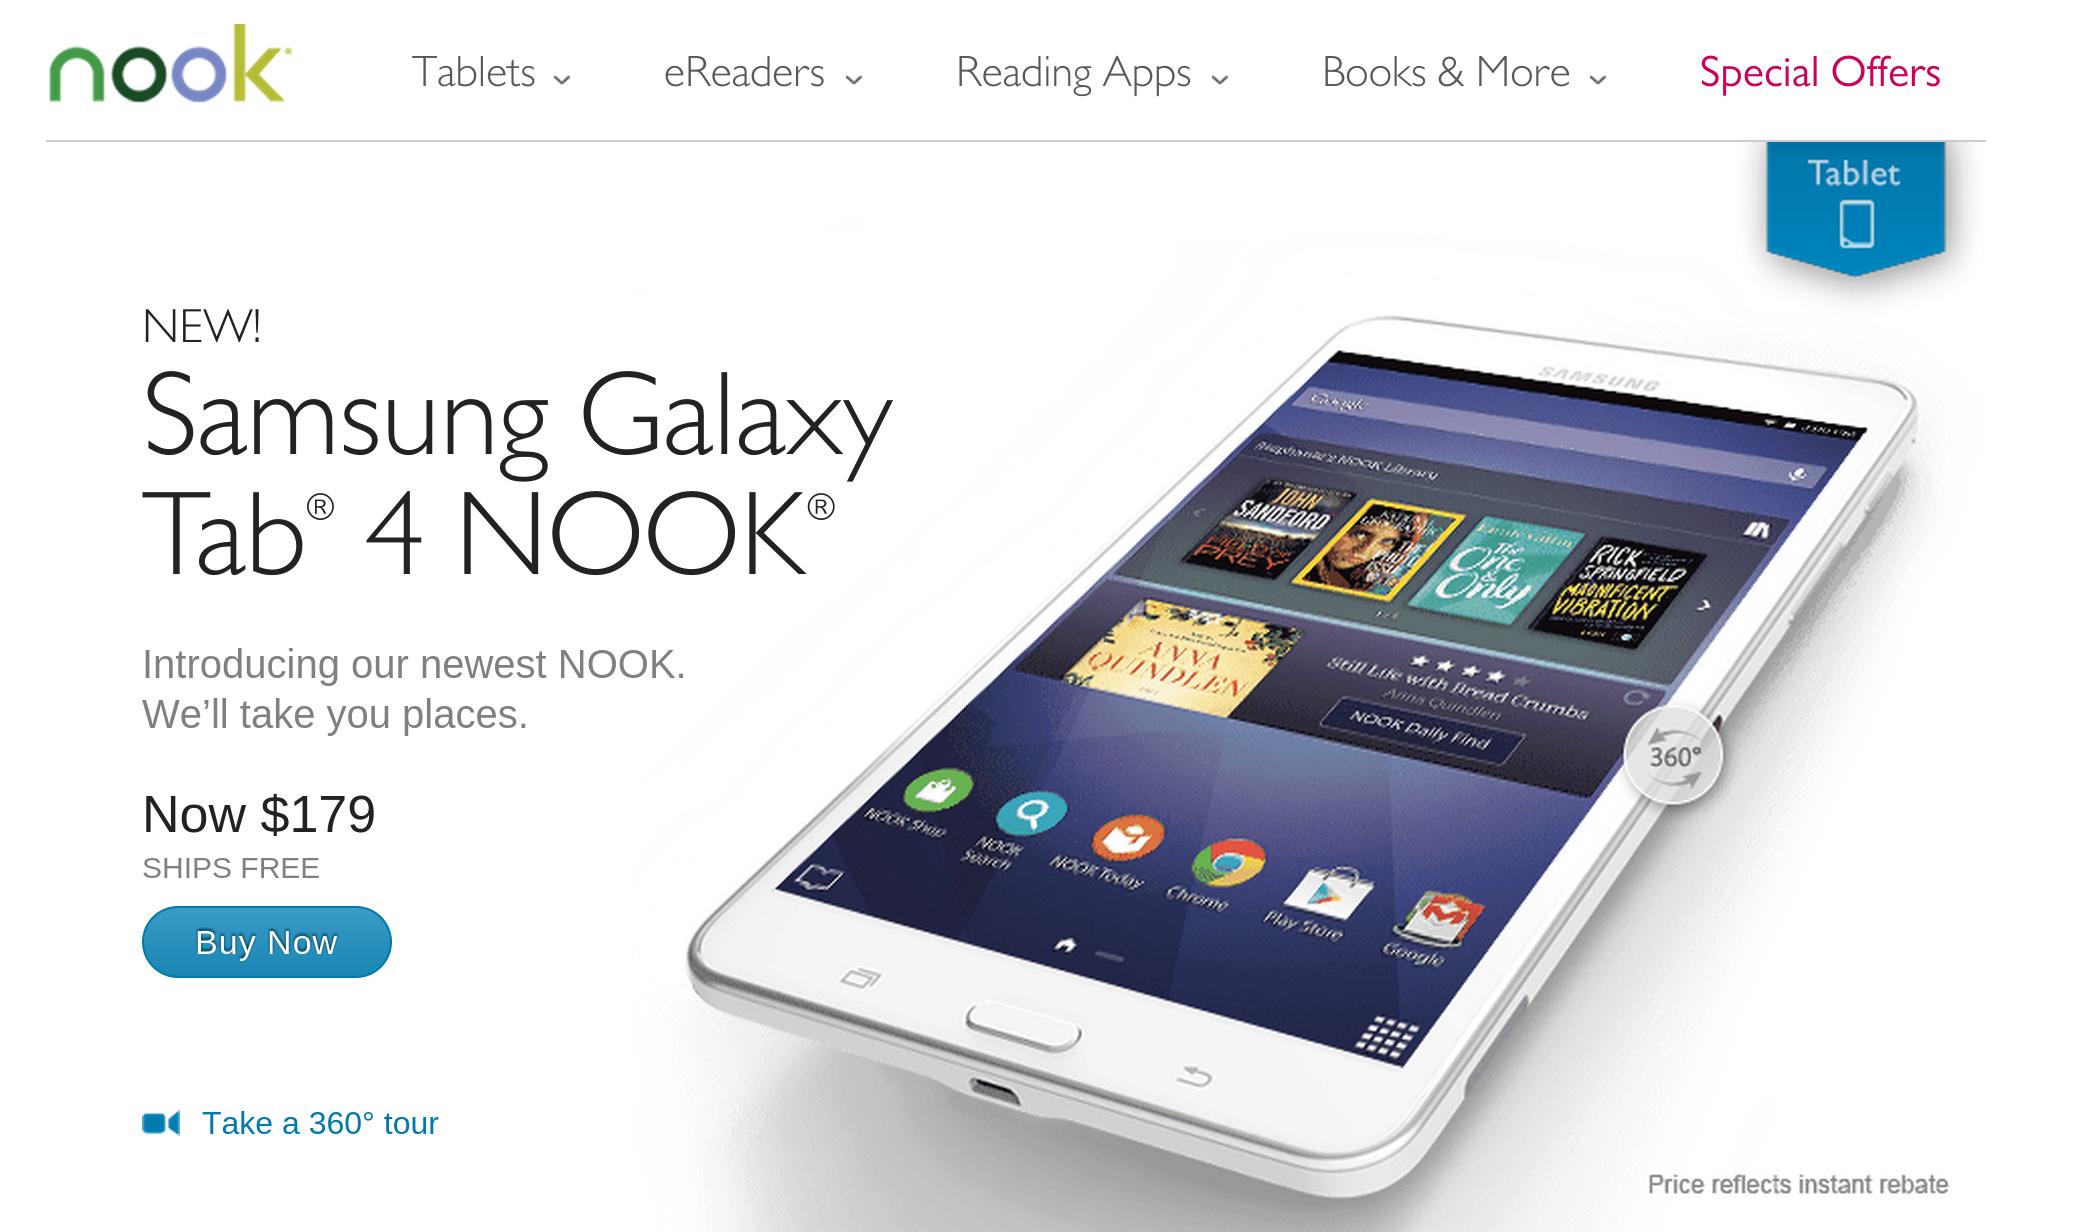 Barnes Noble Begins Selling The Samsung Galaxy Tab 4 Nook A